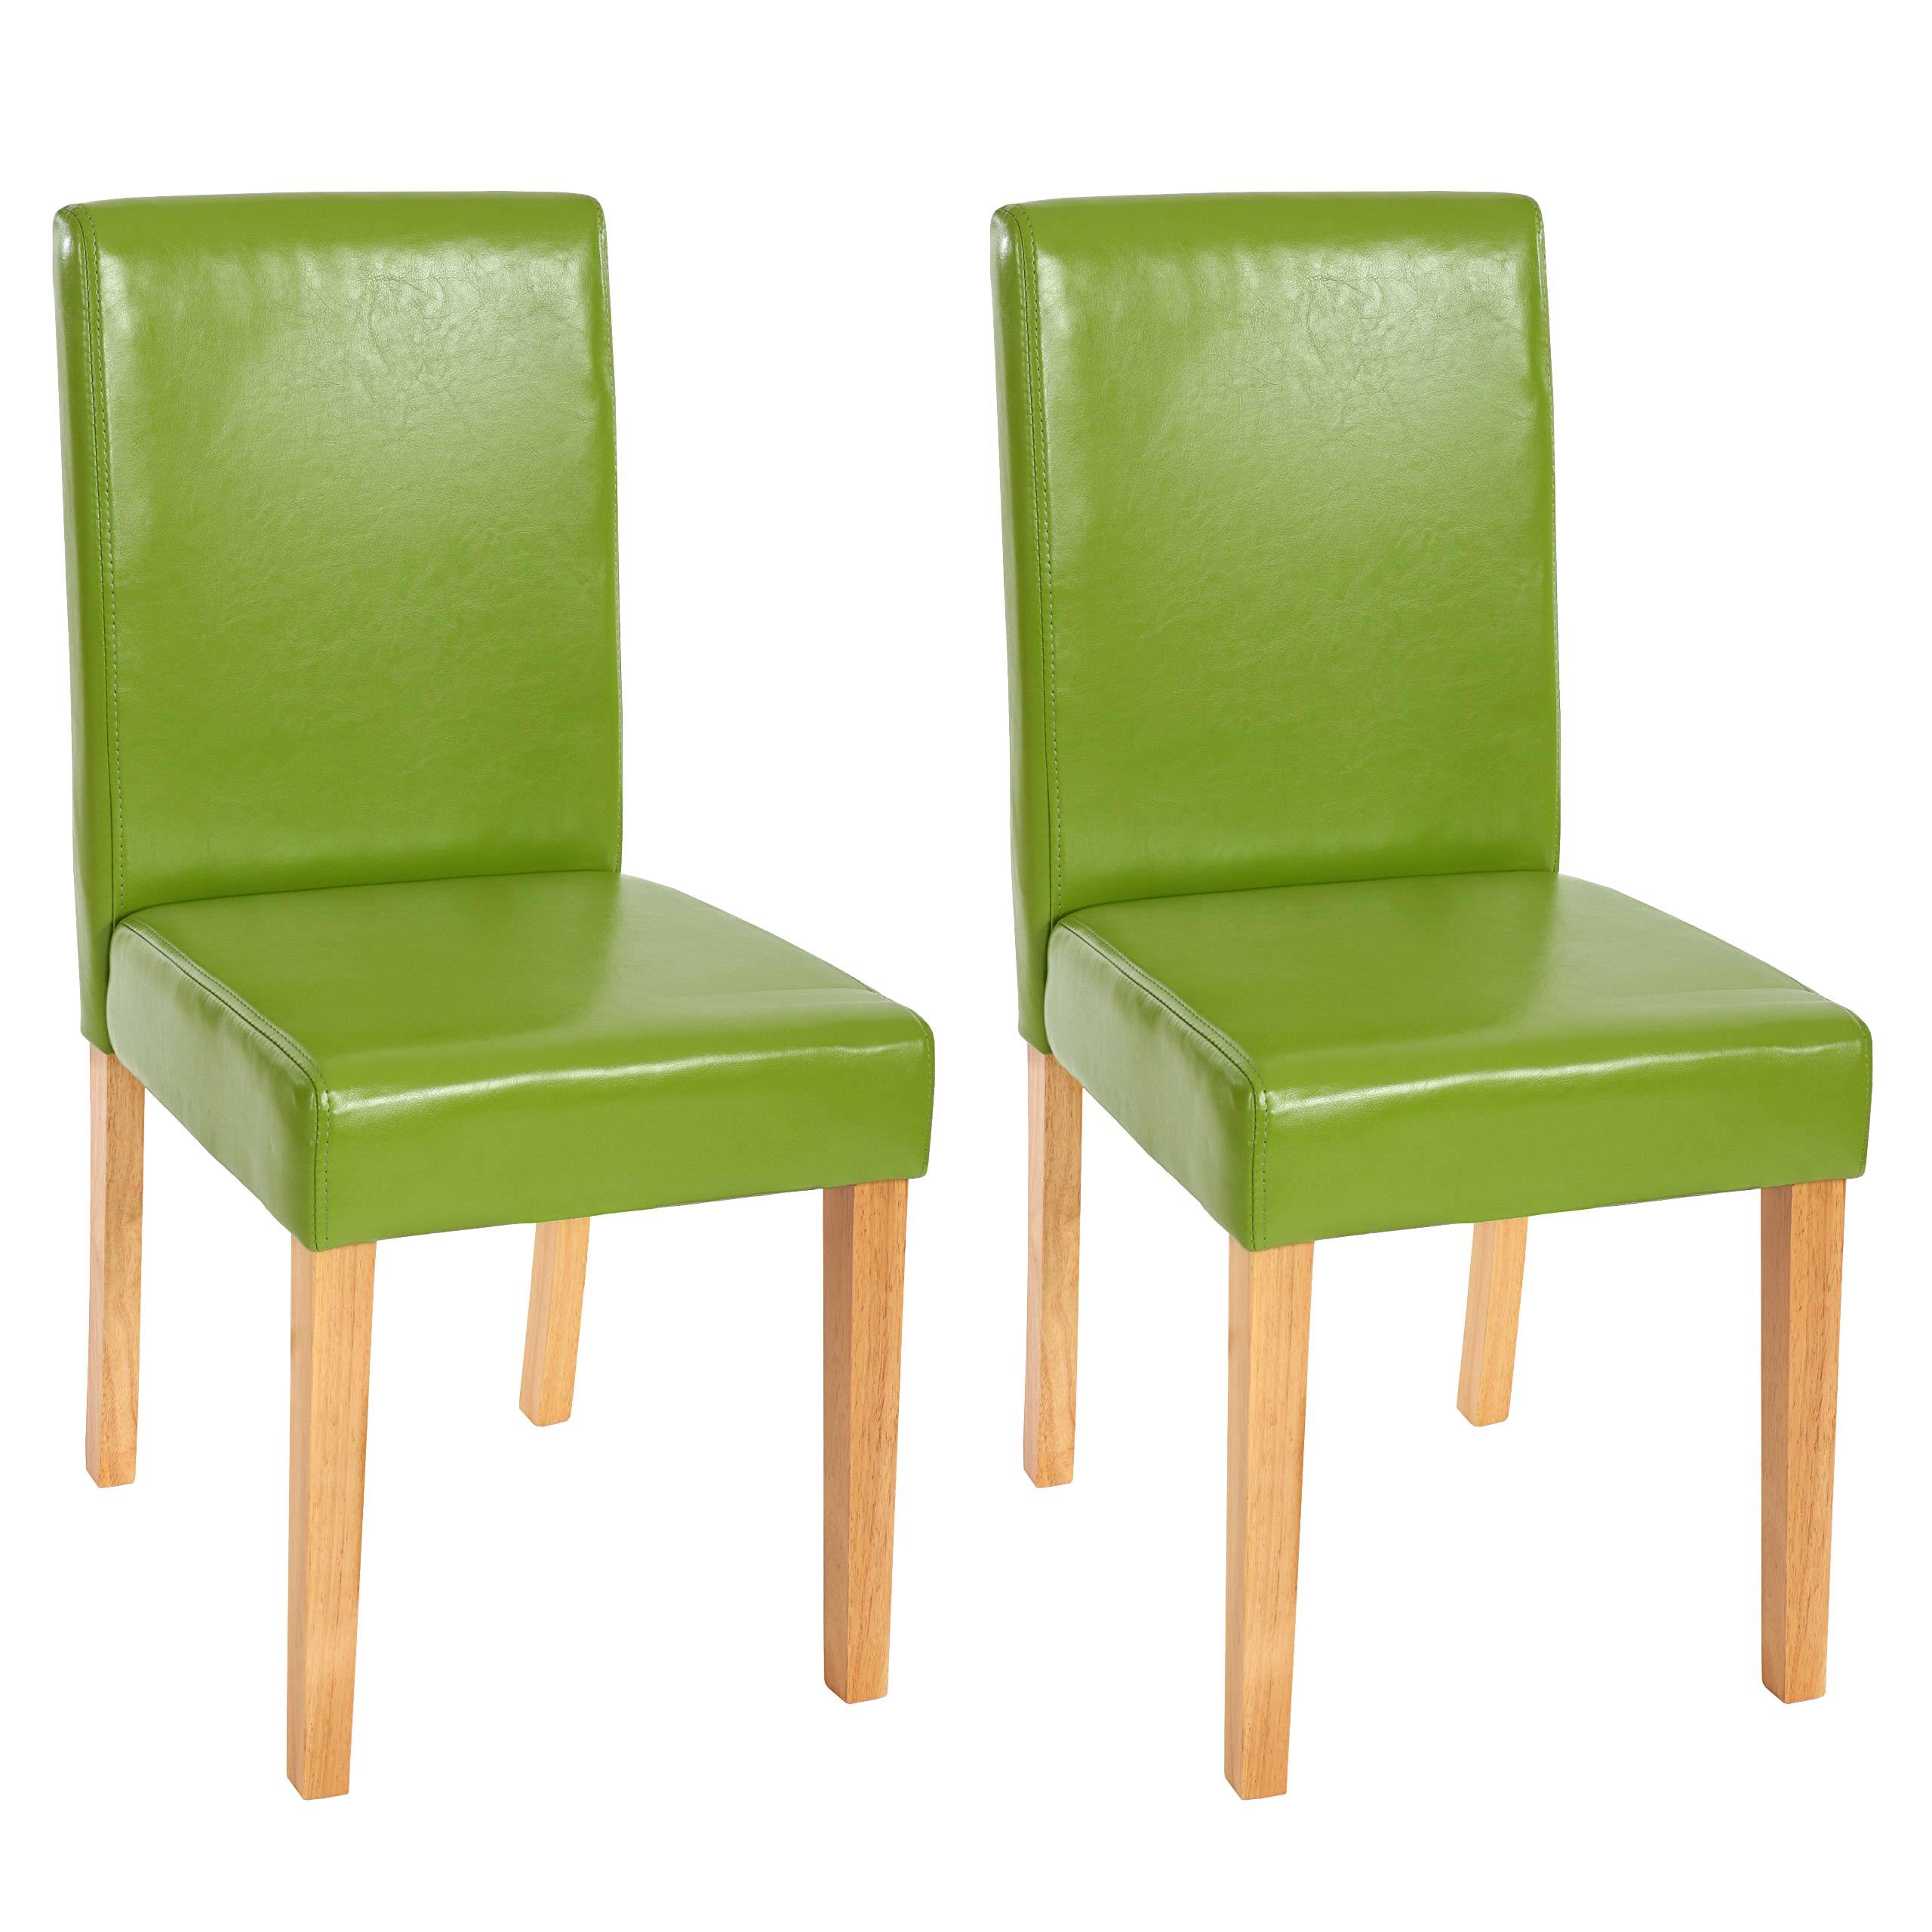 2x esszimmerstuhl stuhl lehnstuhl littau kunstleder for Stuhl 4 beine